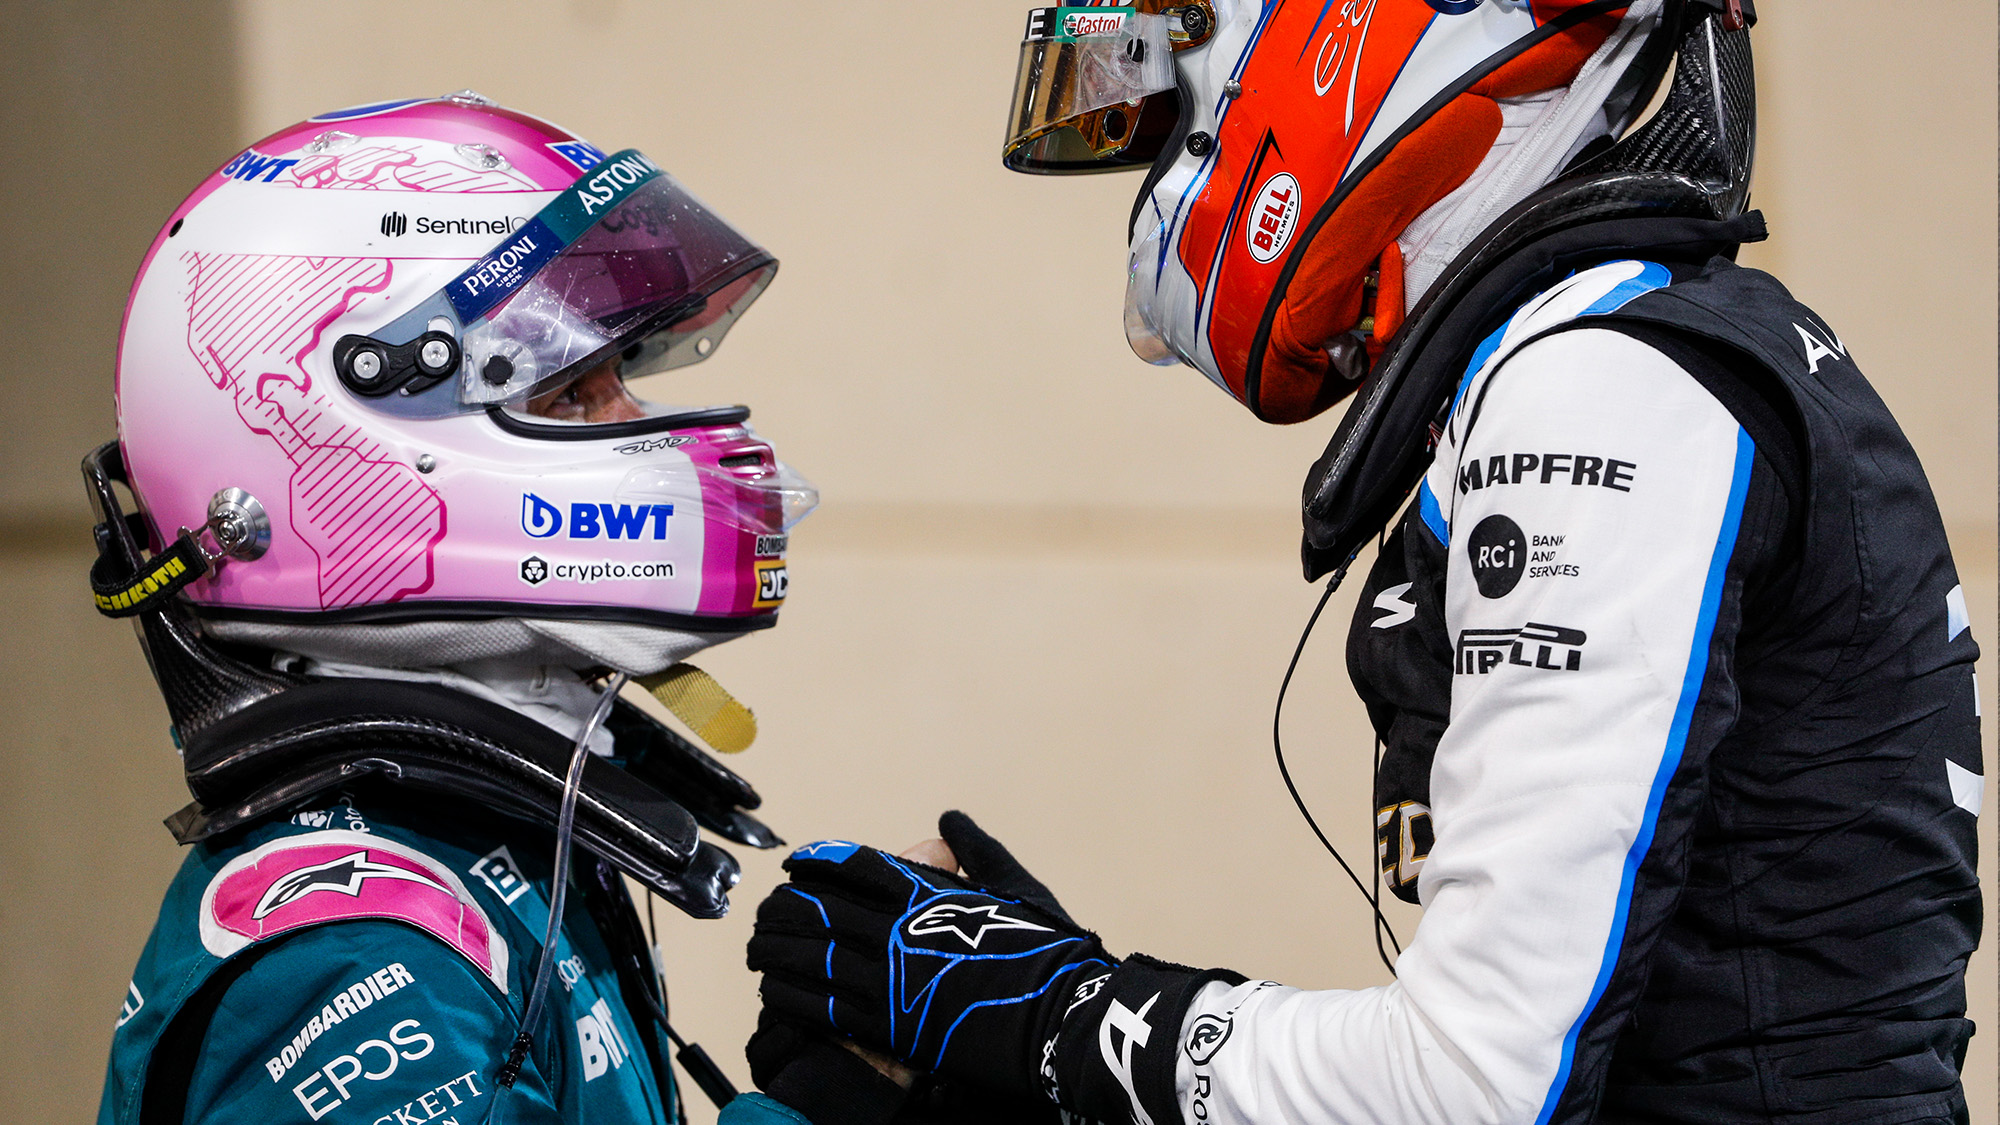 Sebastian Vettel with Esteban Ocon at the 2021 Bahrain Grand Prix